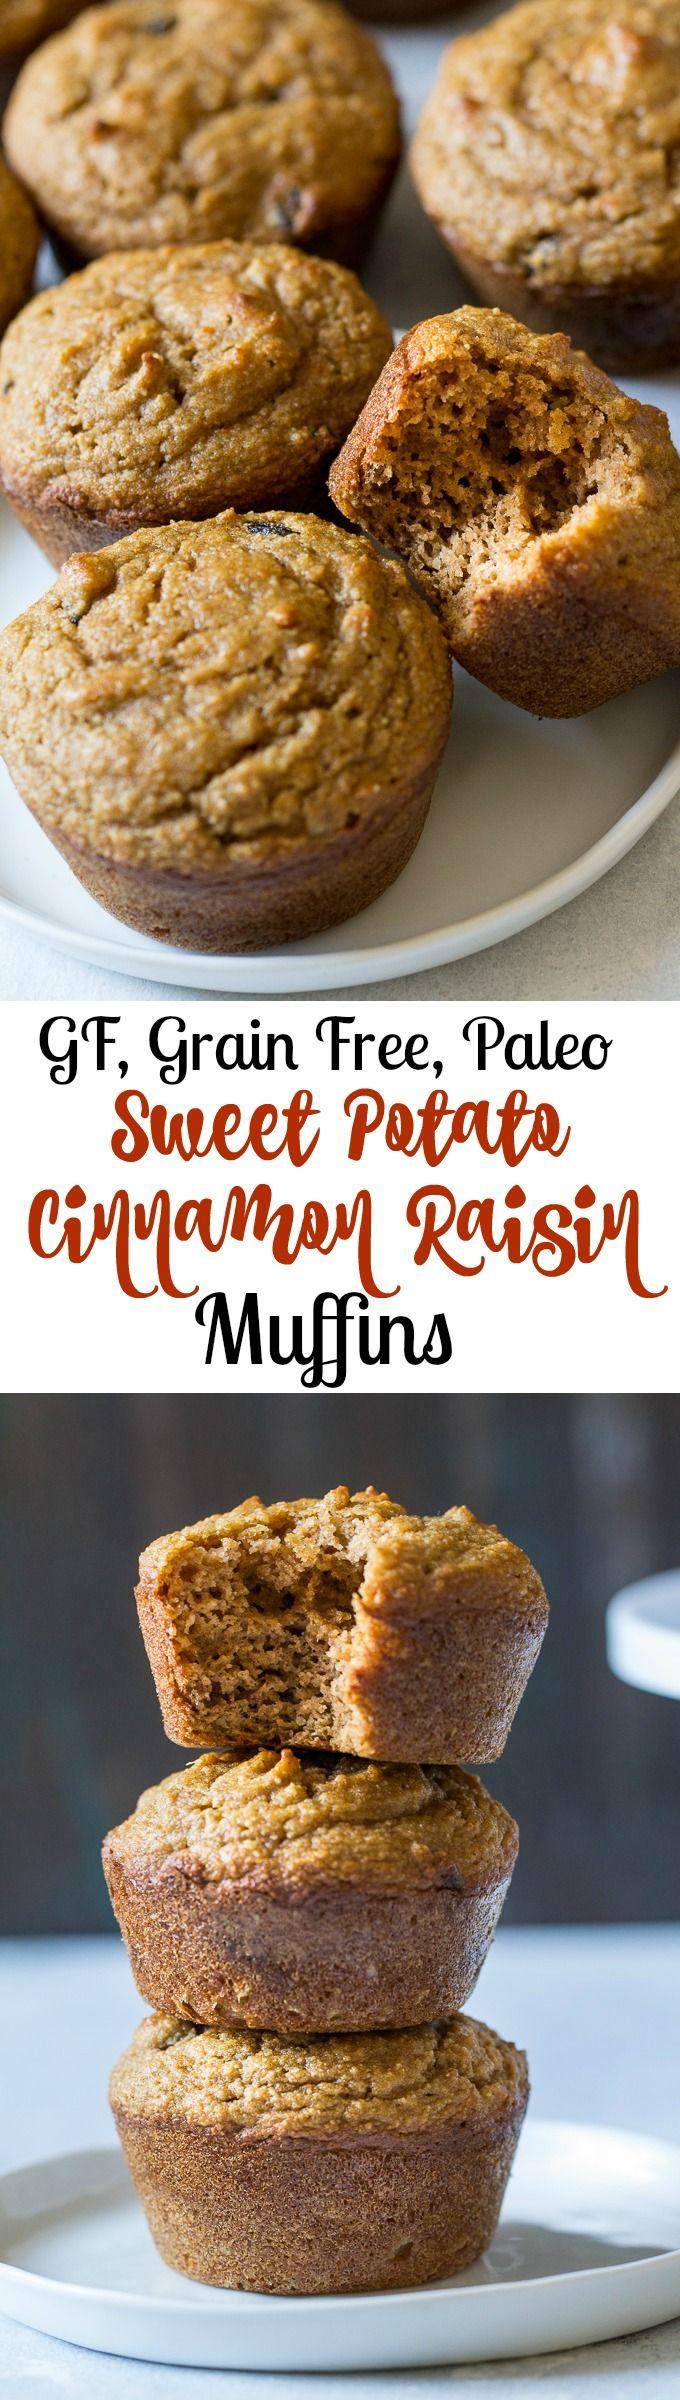 Cinnamon Raisin Sweet Potato Muffins that are grain free, dairy free, Paleo, kid friendly, great for snacks and breakfast.